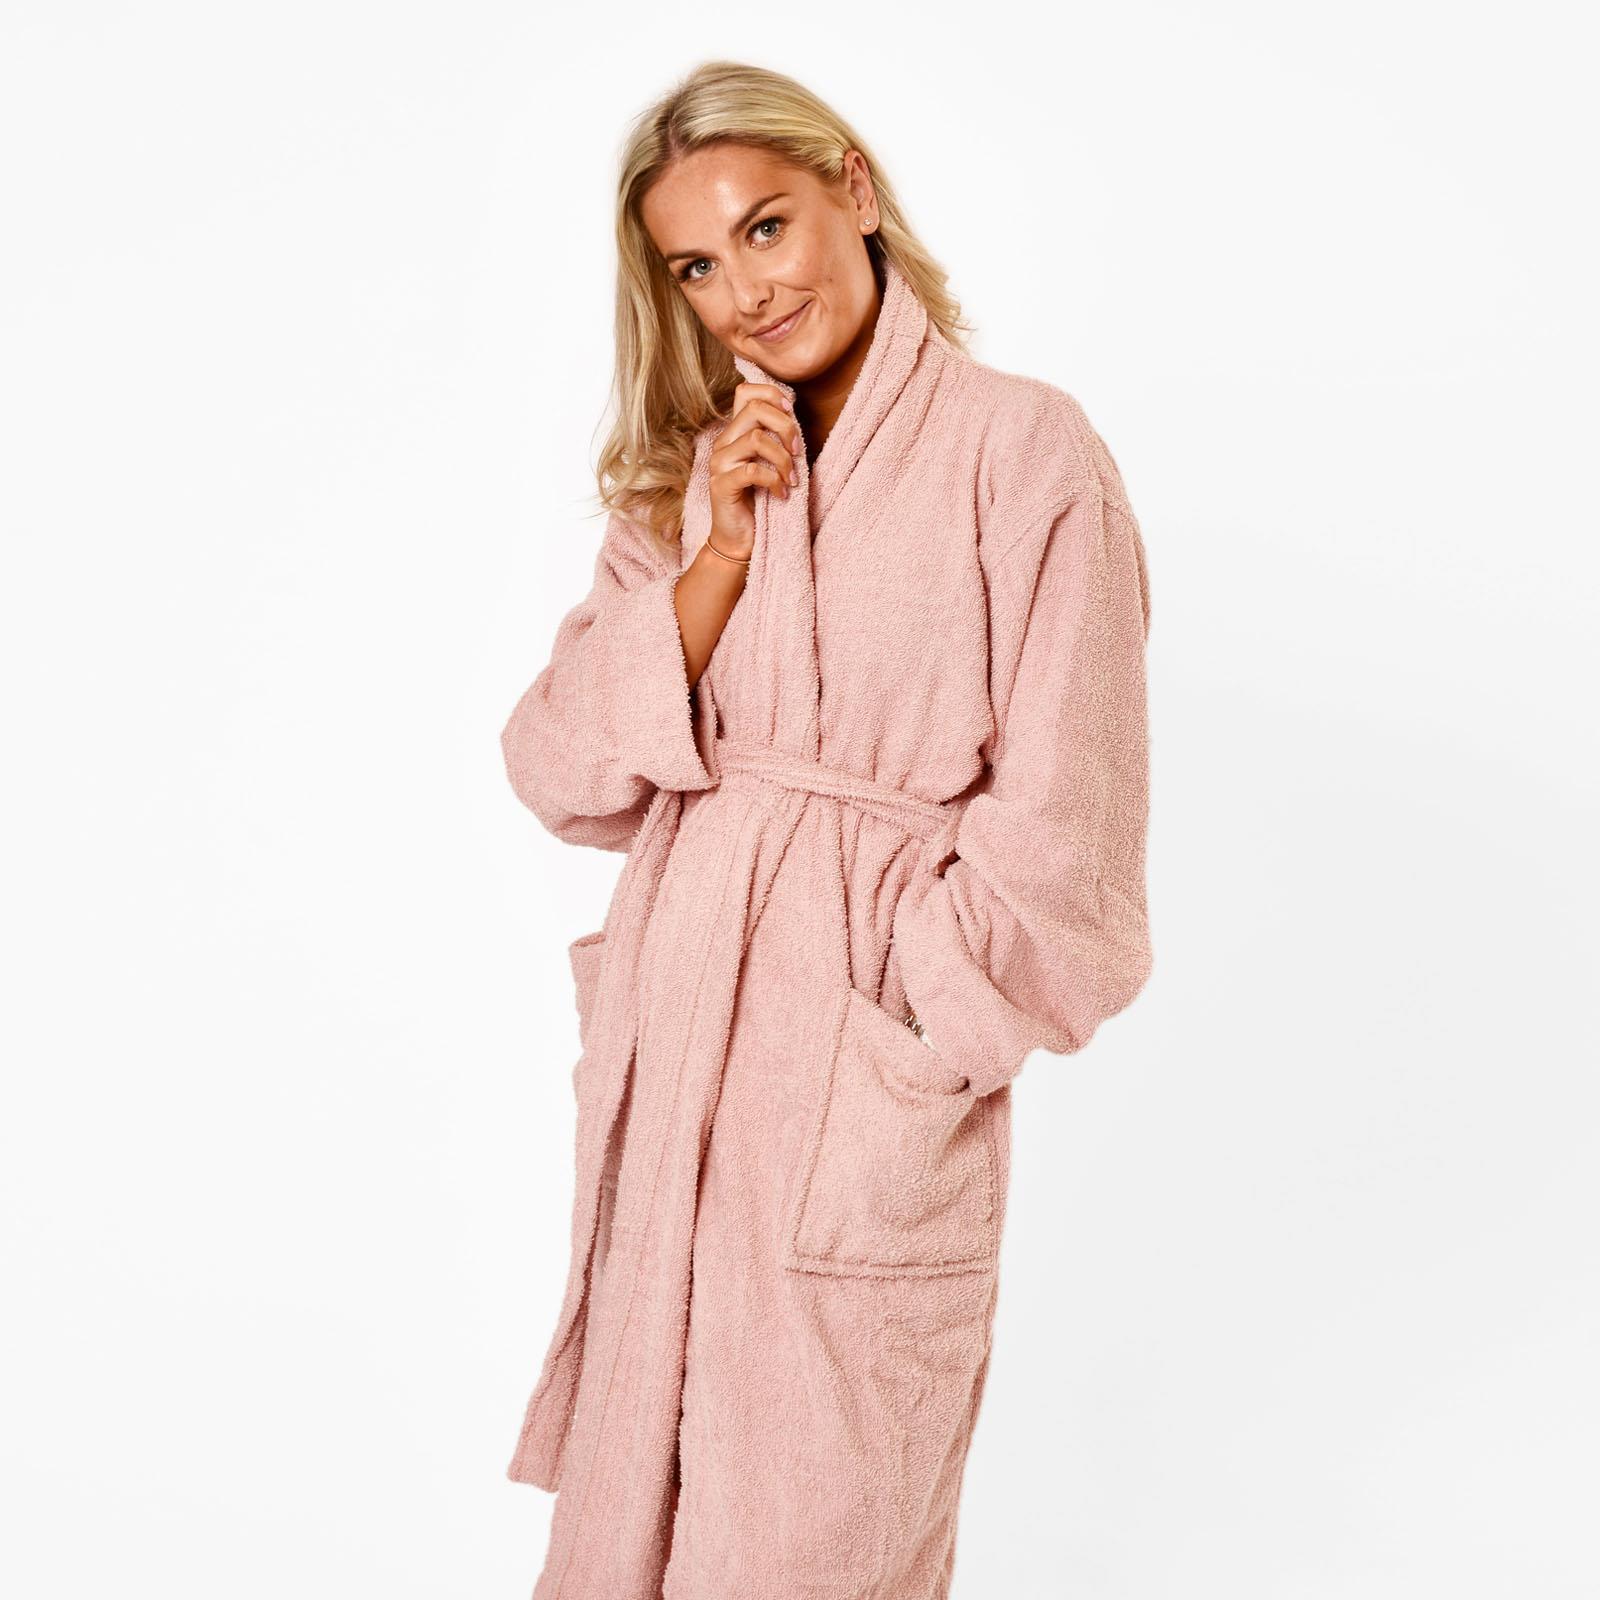 thumbnail 8 - Brentfords Luxury 100% Cotton Bath Robe Terry Towel Soft Dressing Gown Unisex